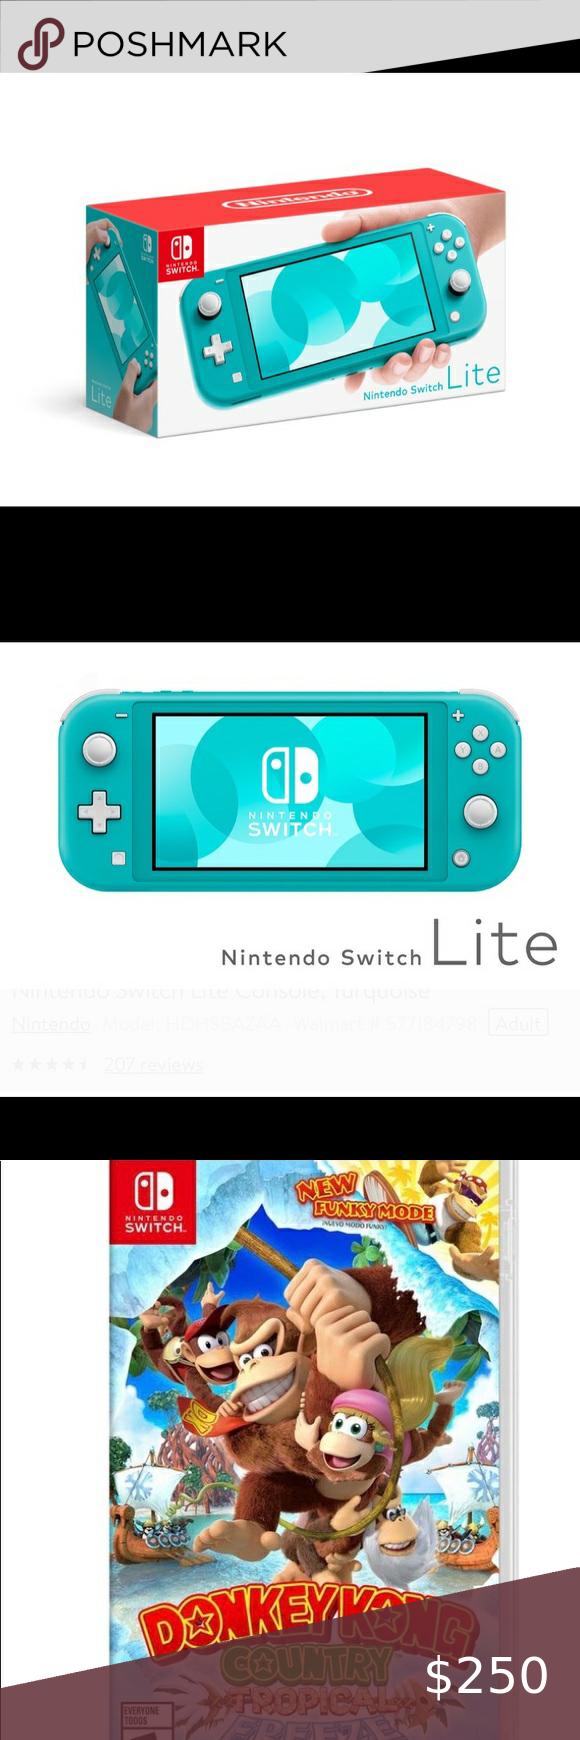 New Nintendo Switch Lite And Donkey Kong Brand New Nintendo Switch Lite And Donkey Kong Game Included Nintendo O Donkey Kong Donkey Kong Games Nintendo Switch